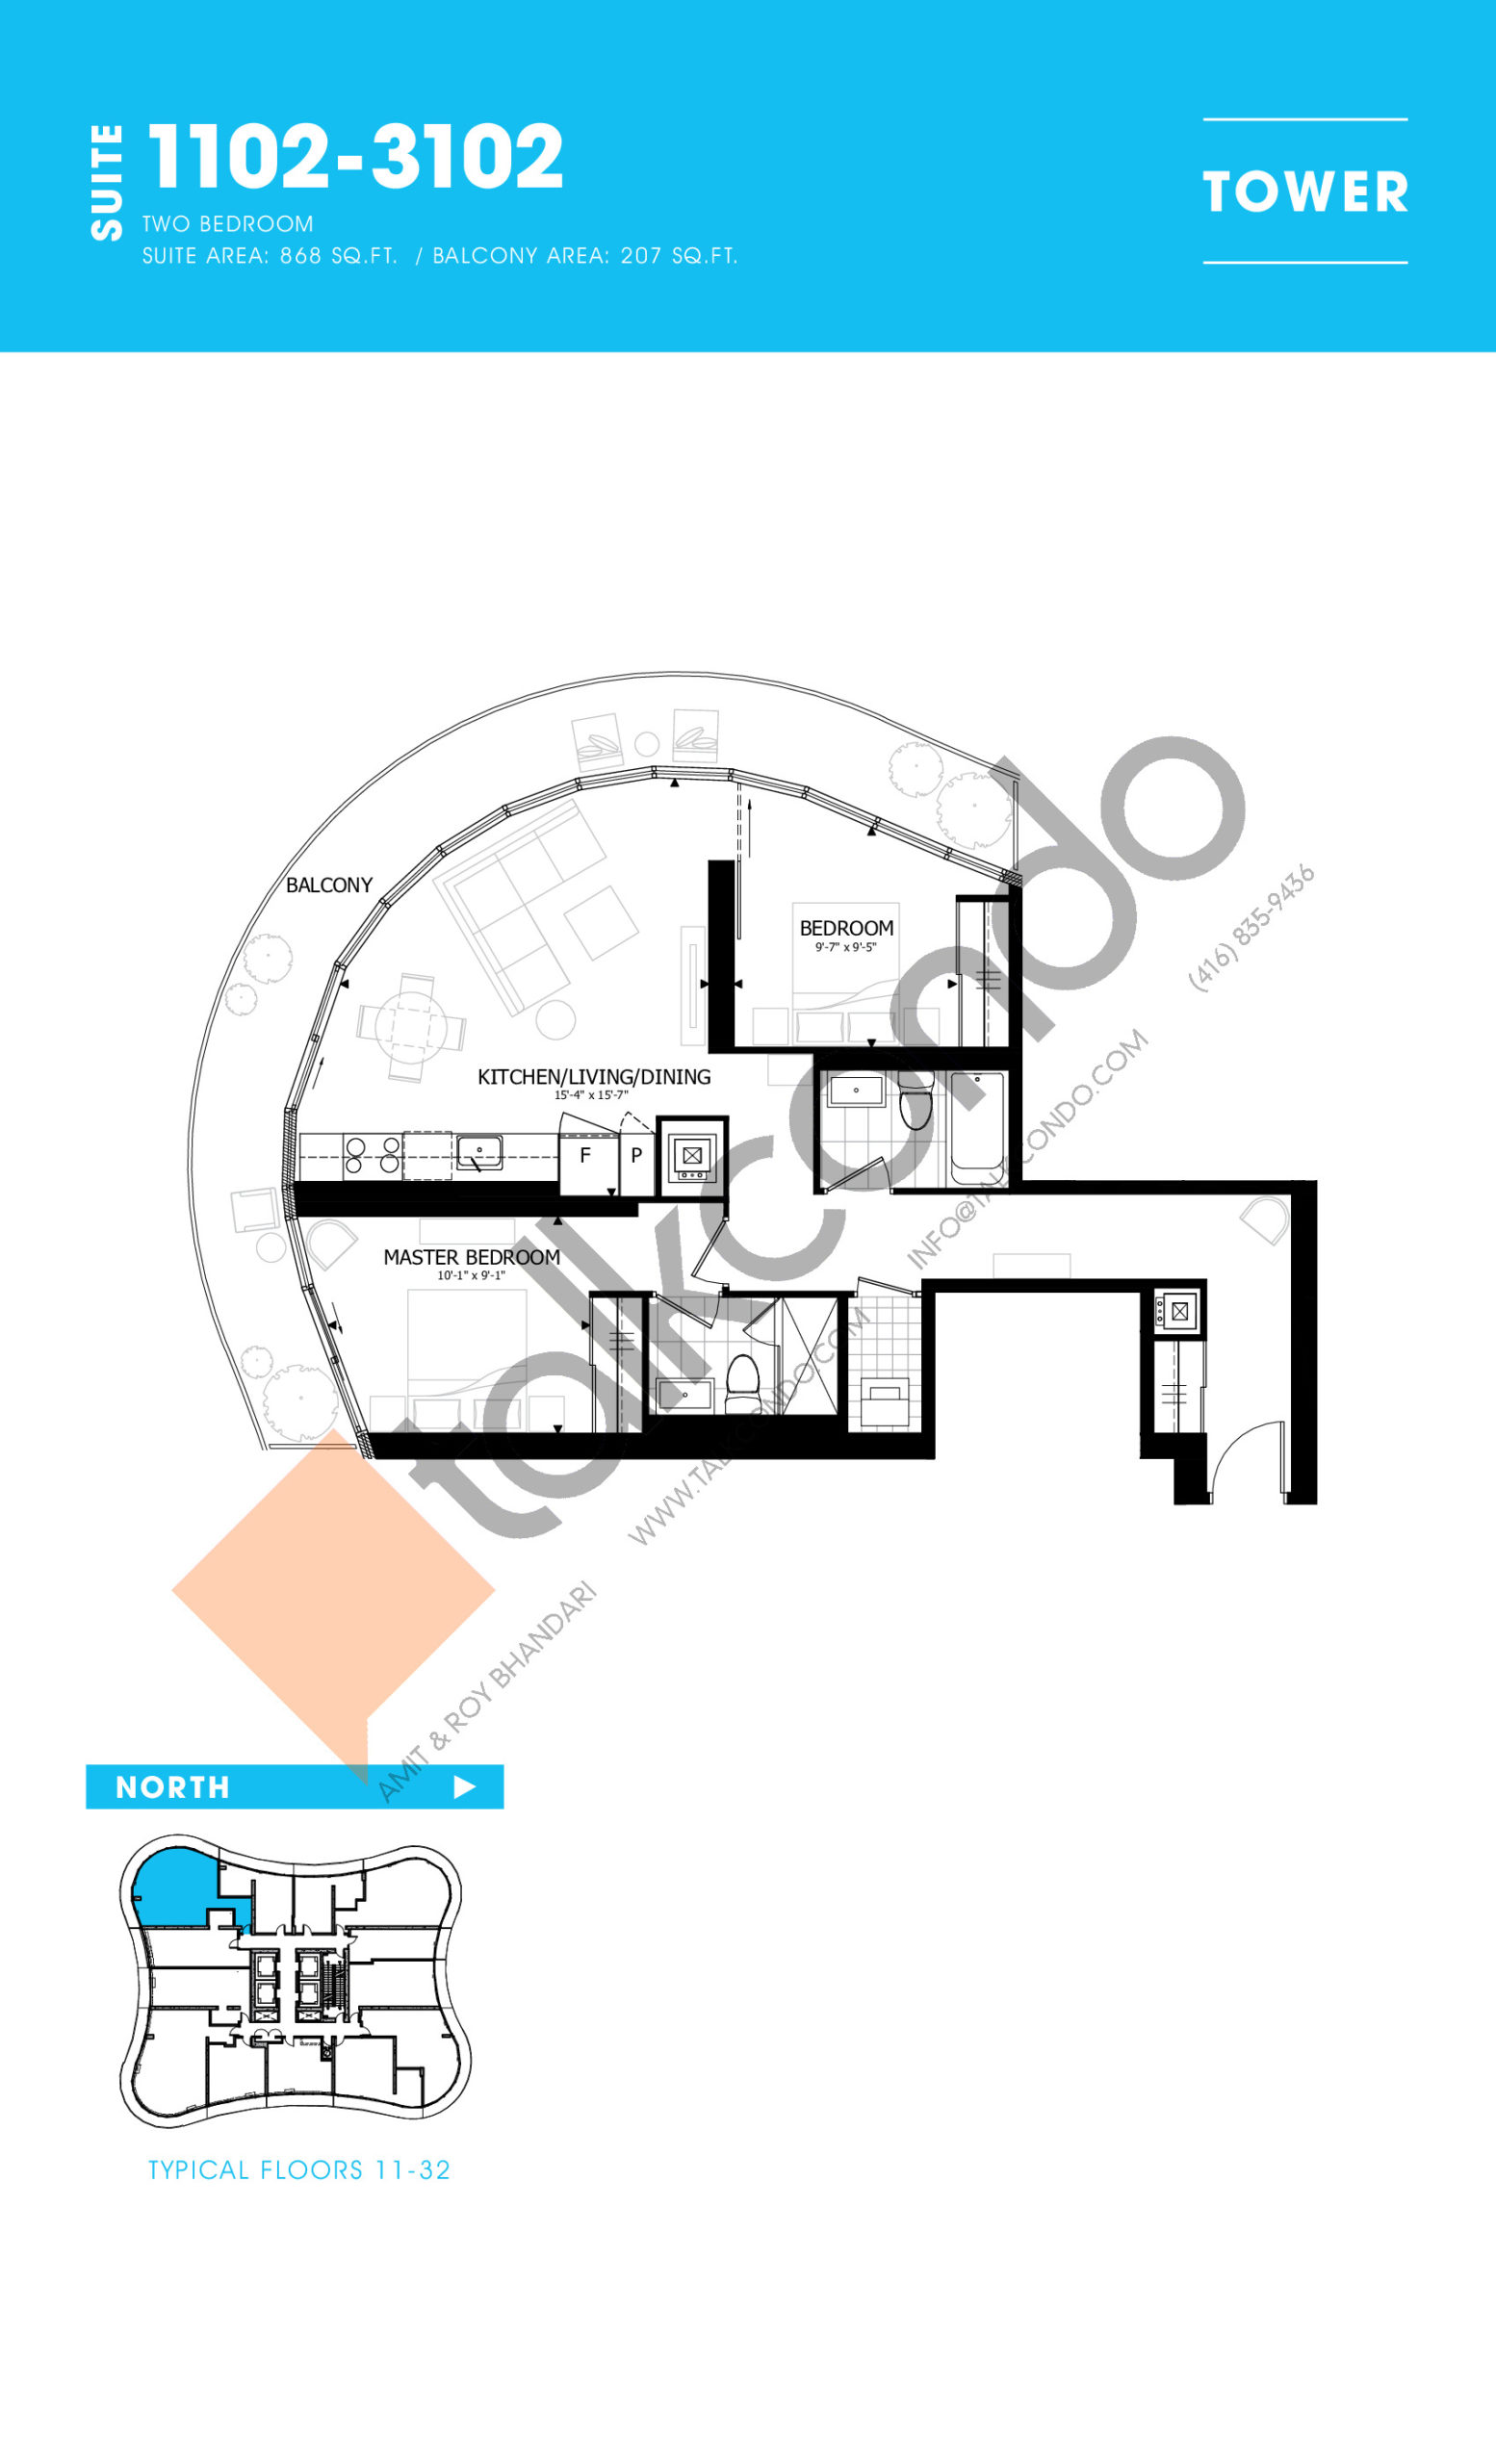 1102-3102 Floor Plan at Stanley Condos - 868 sq.ft